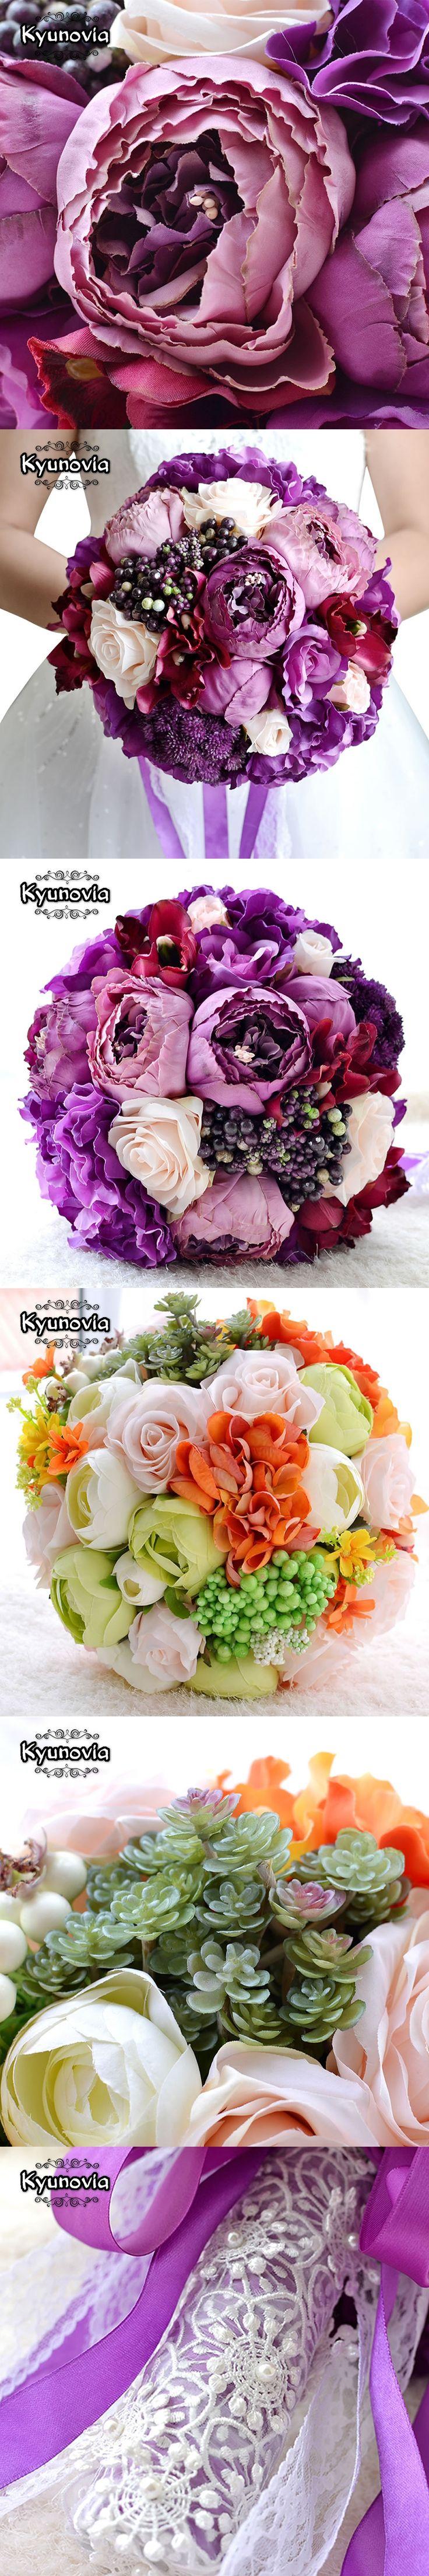 Kyunovia New Bridal Bouquet Assorted Roses Camellias wedding accessories bouquet Artifical Wedding flowers Wedding Bouquet FE13